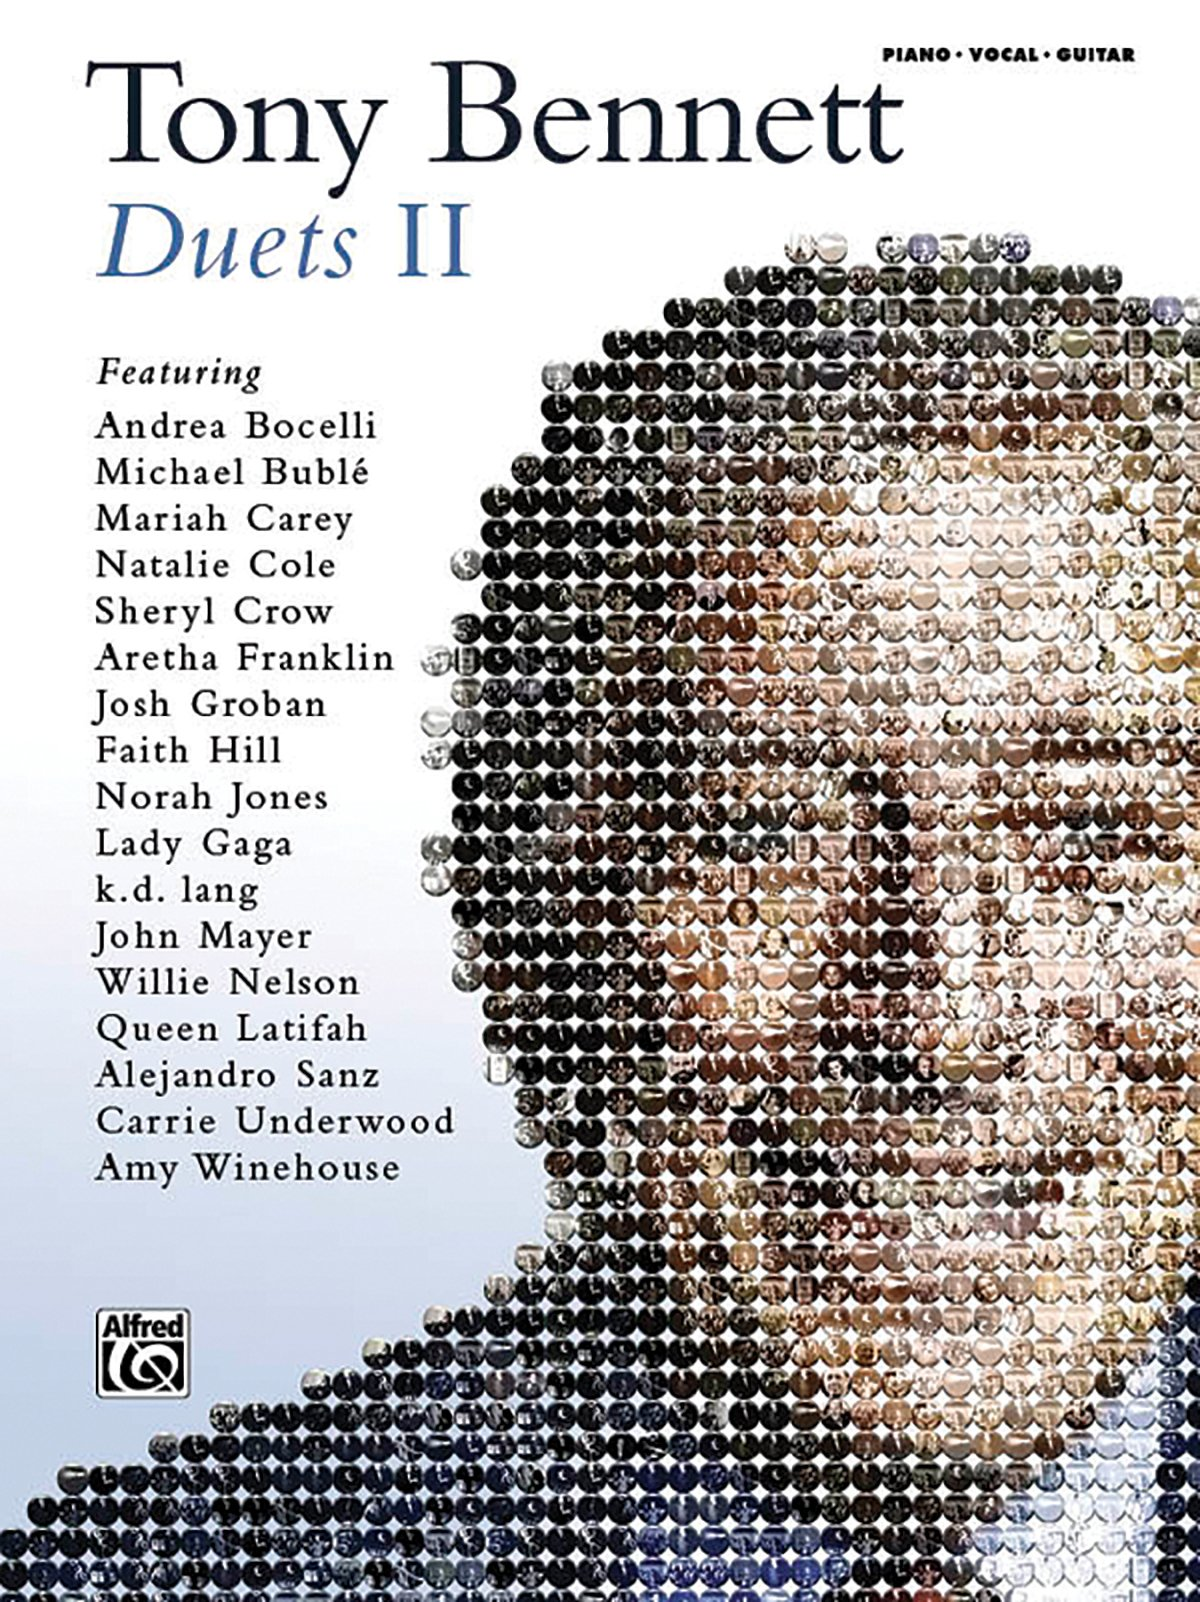 Amazon com: Tony Bennett Duets II: Piano / Vocal / Guitar